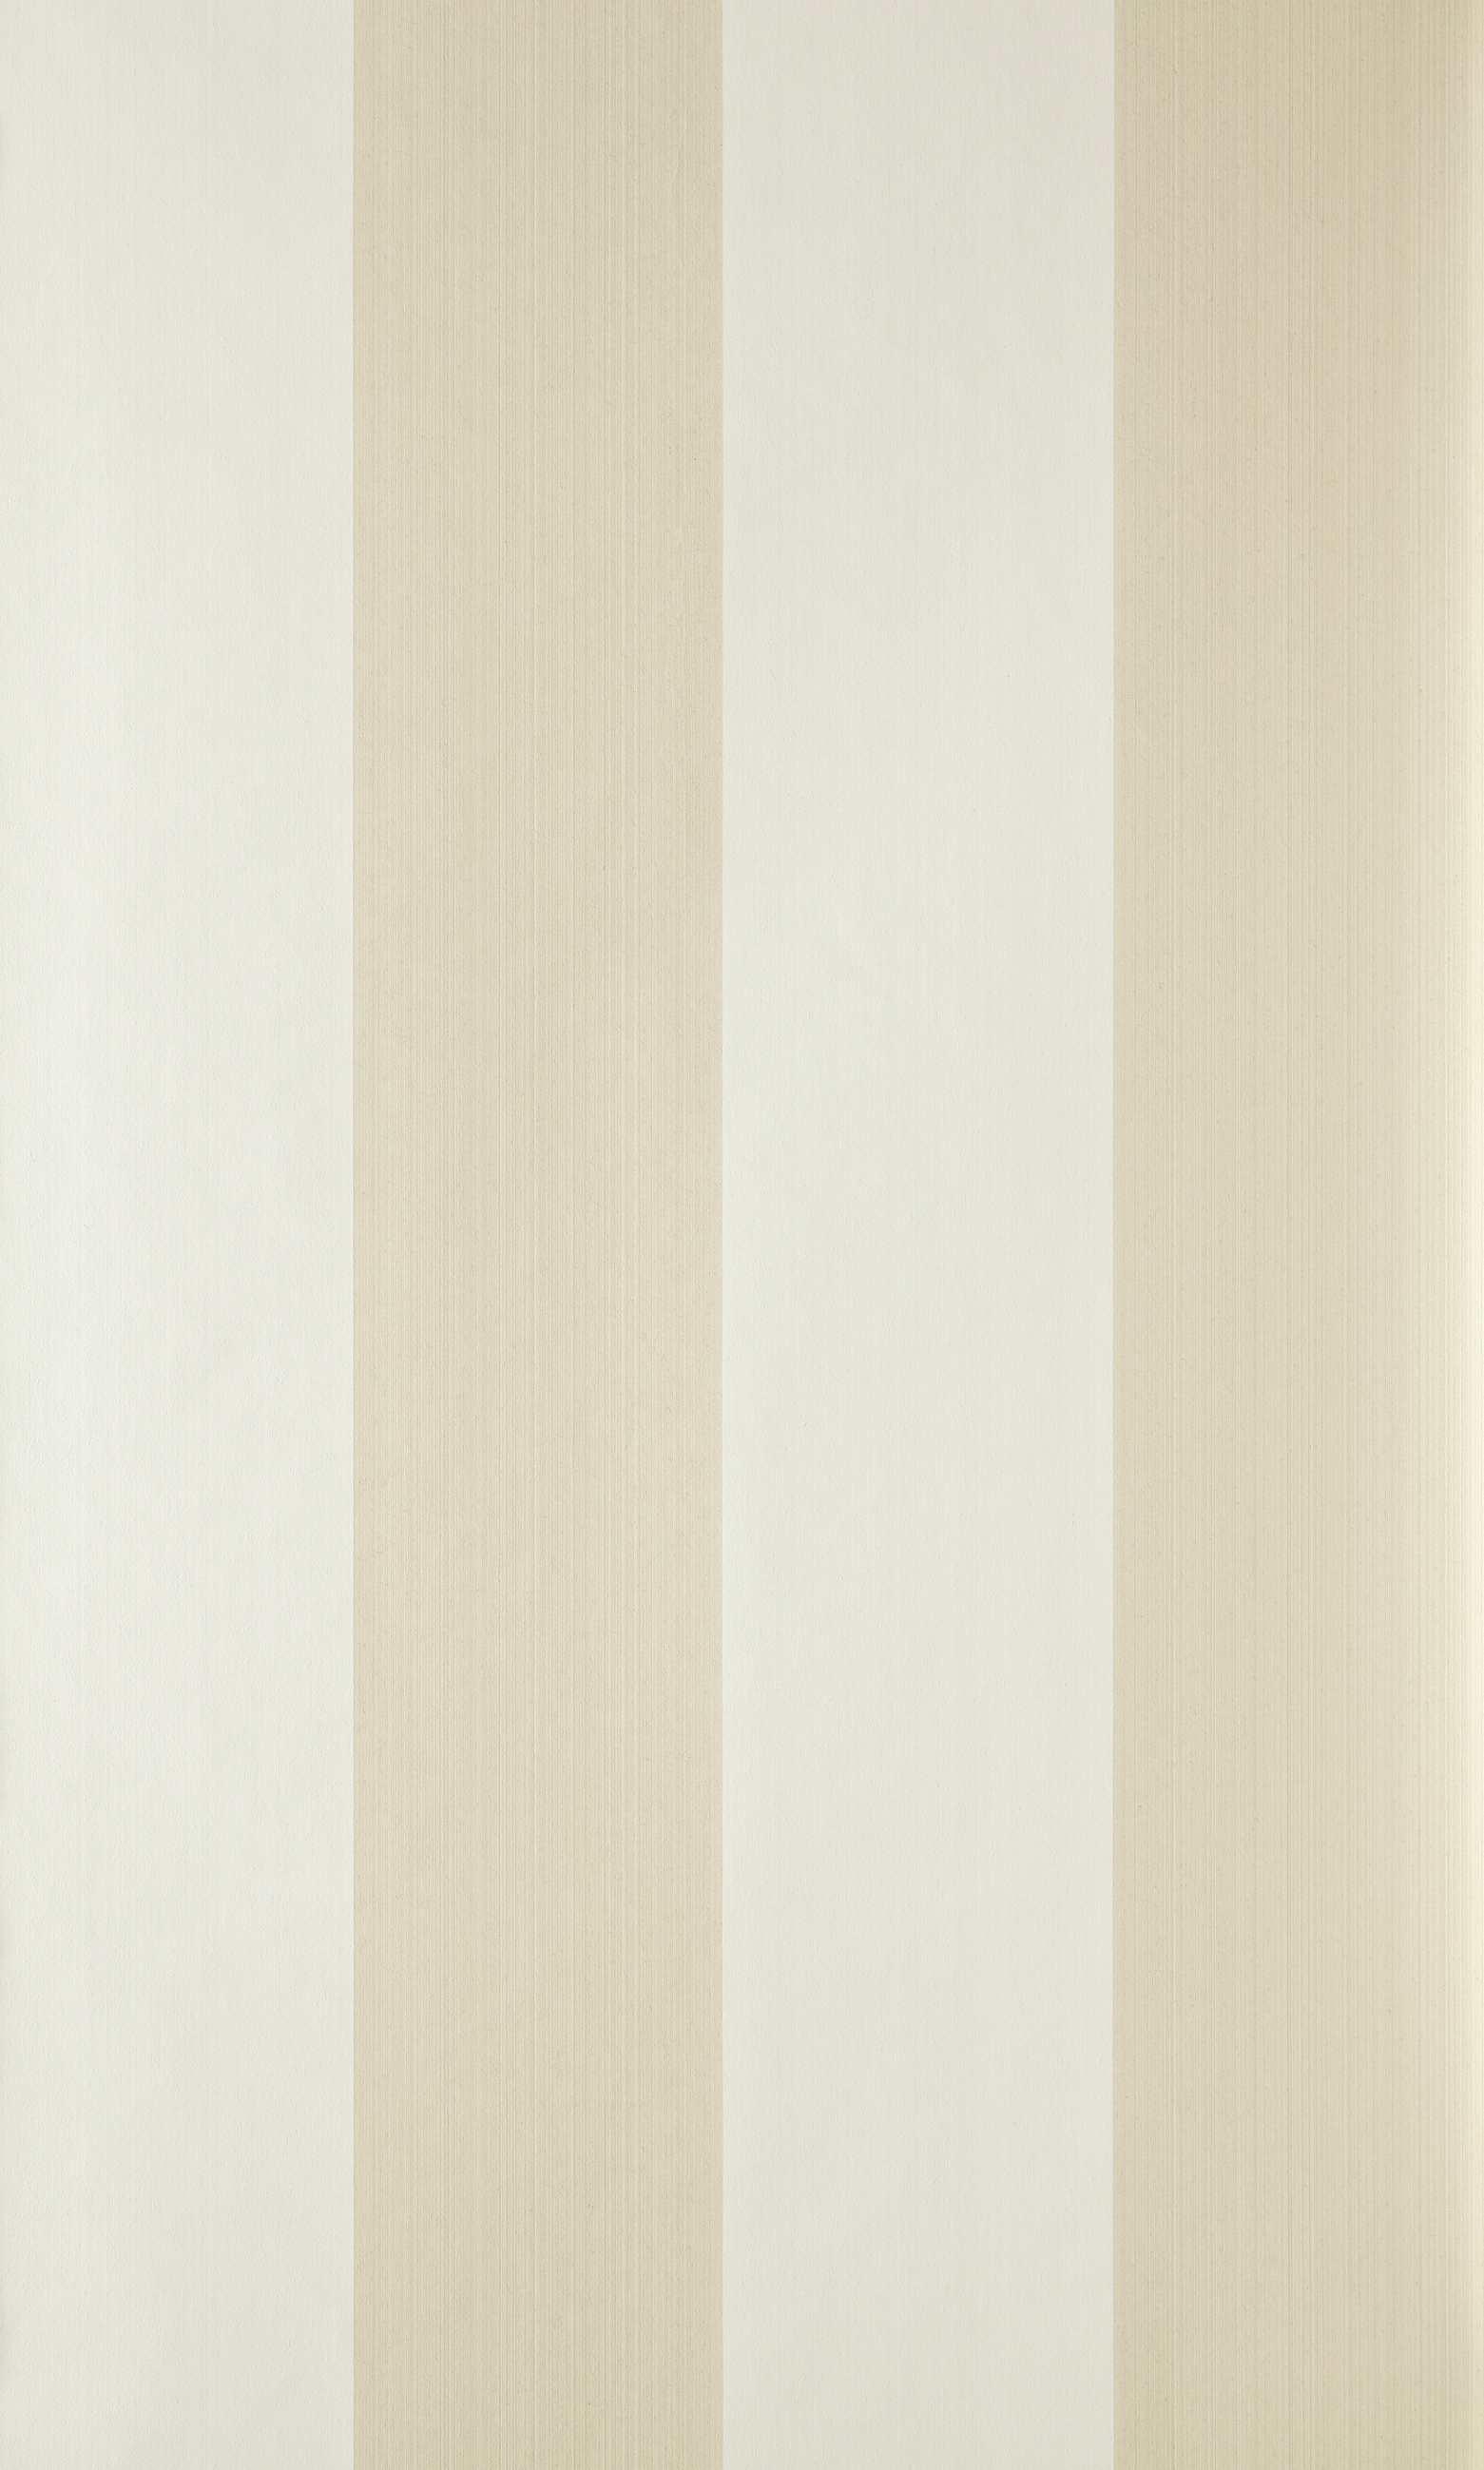 Broad Stripe 1309 $195 Per Roll  Order Now